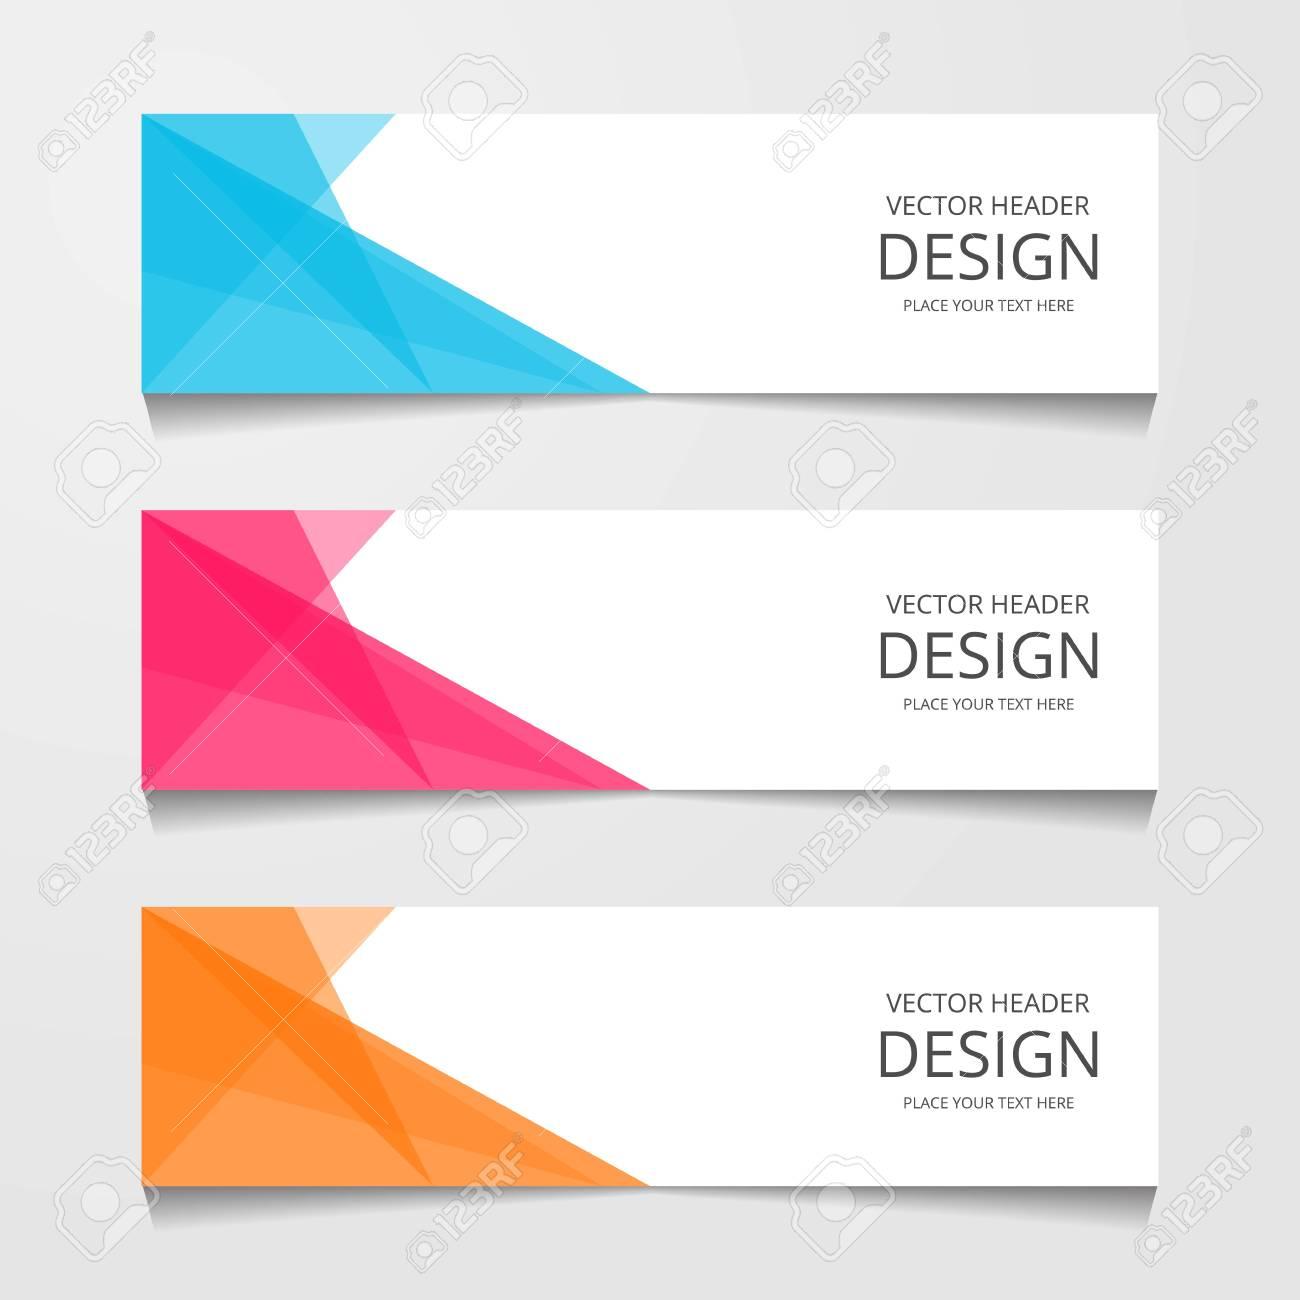 Abstract design banner, web template, layout header templates, modern vector illustration - 112314900